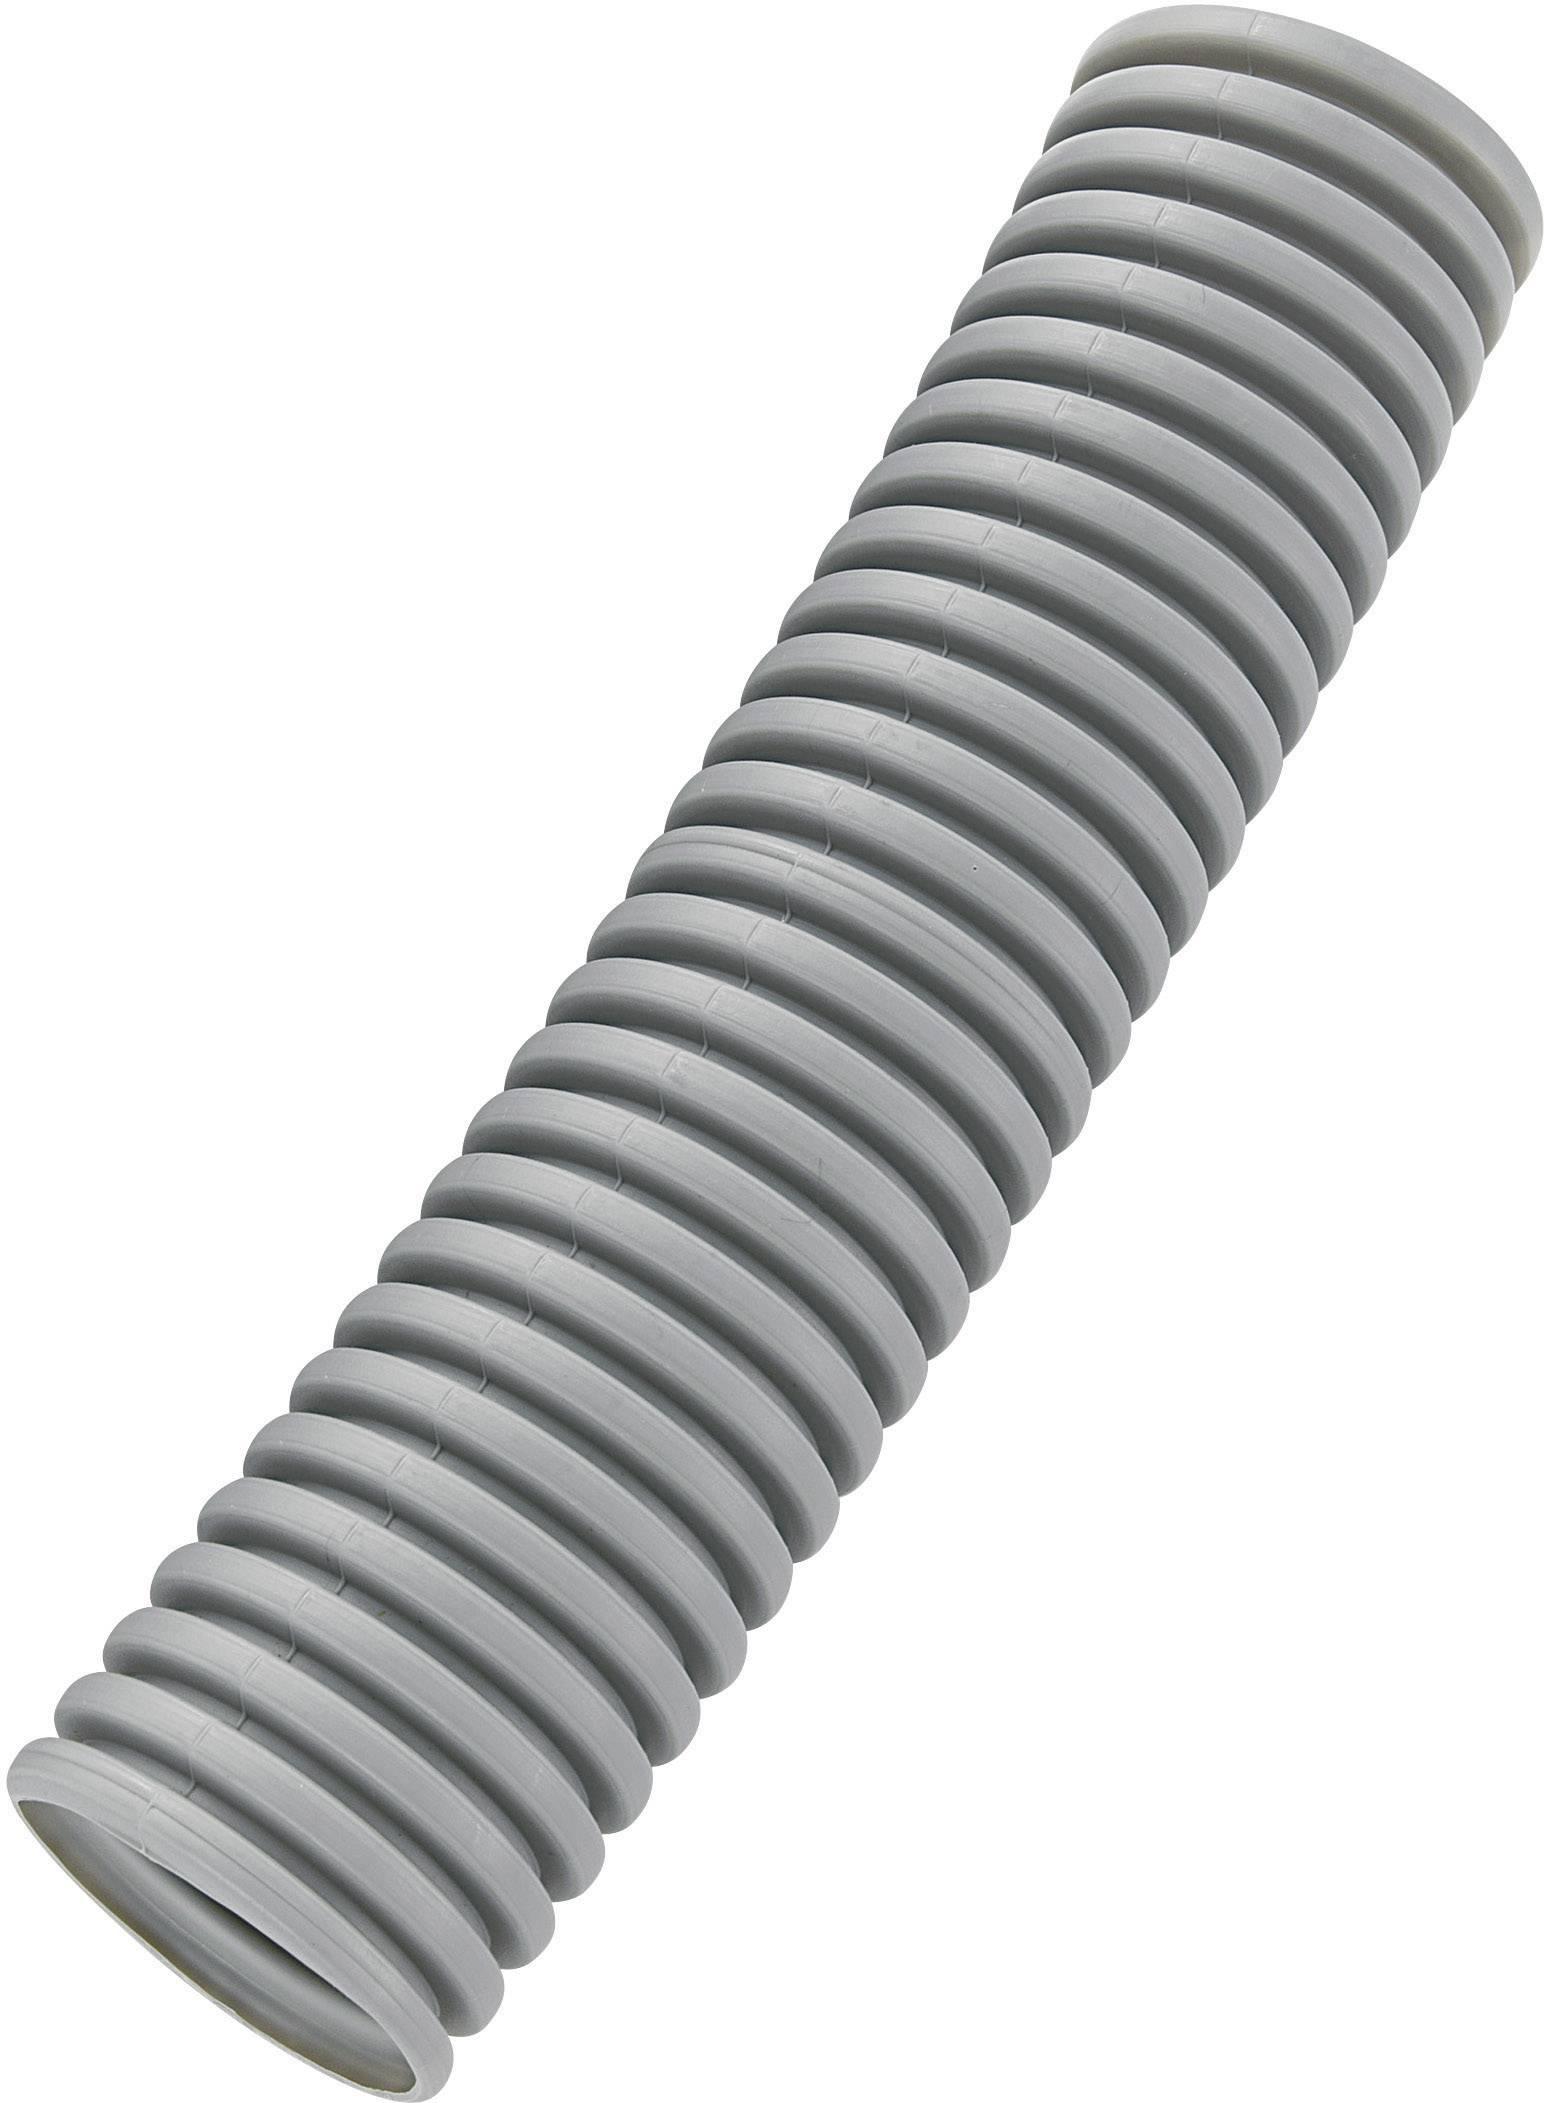 Husí krk KSS BGR48P, 48 mm, šedá